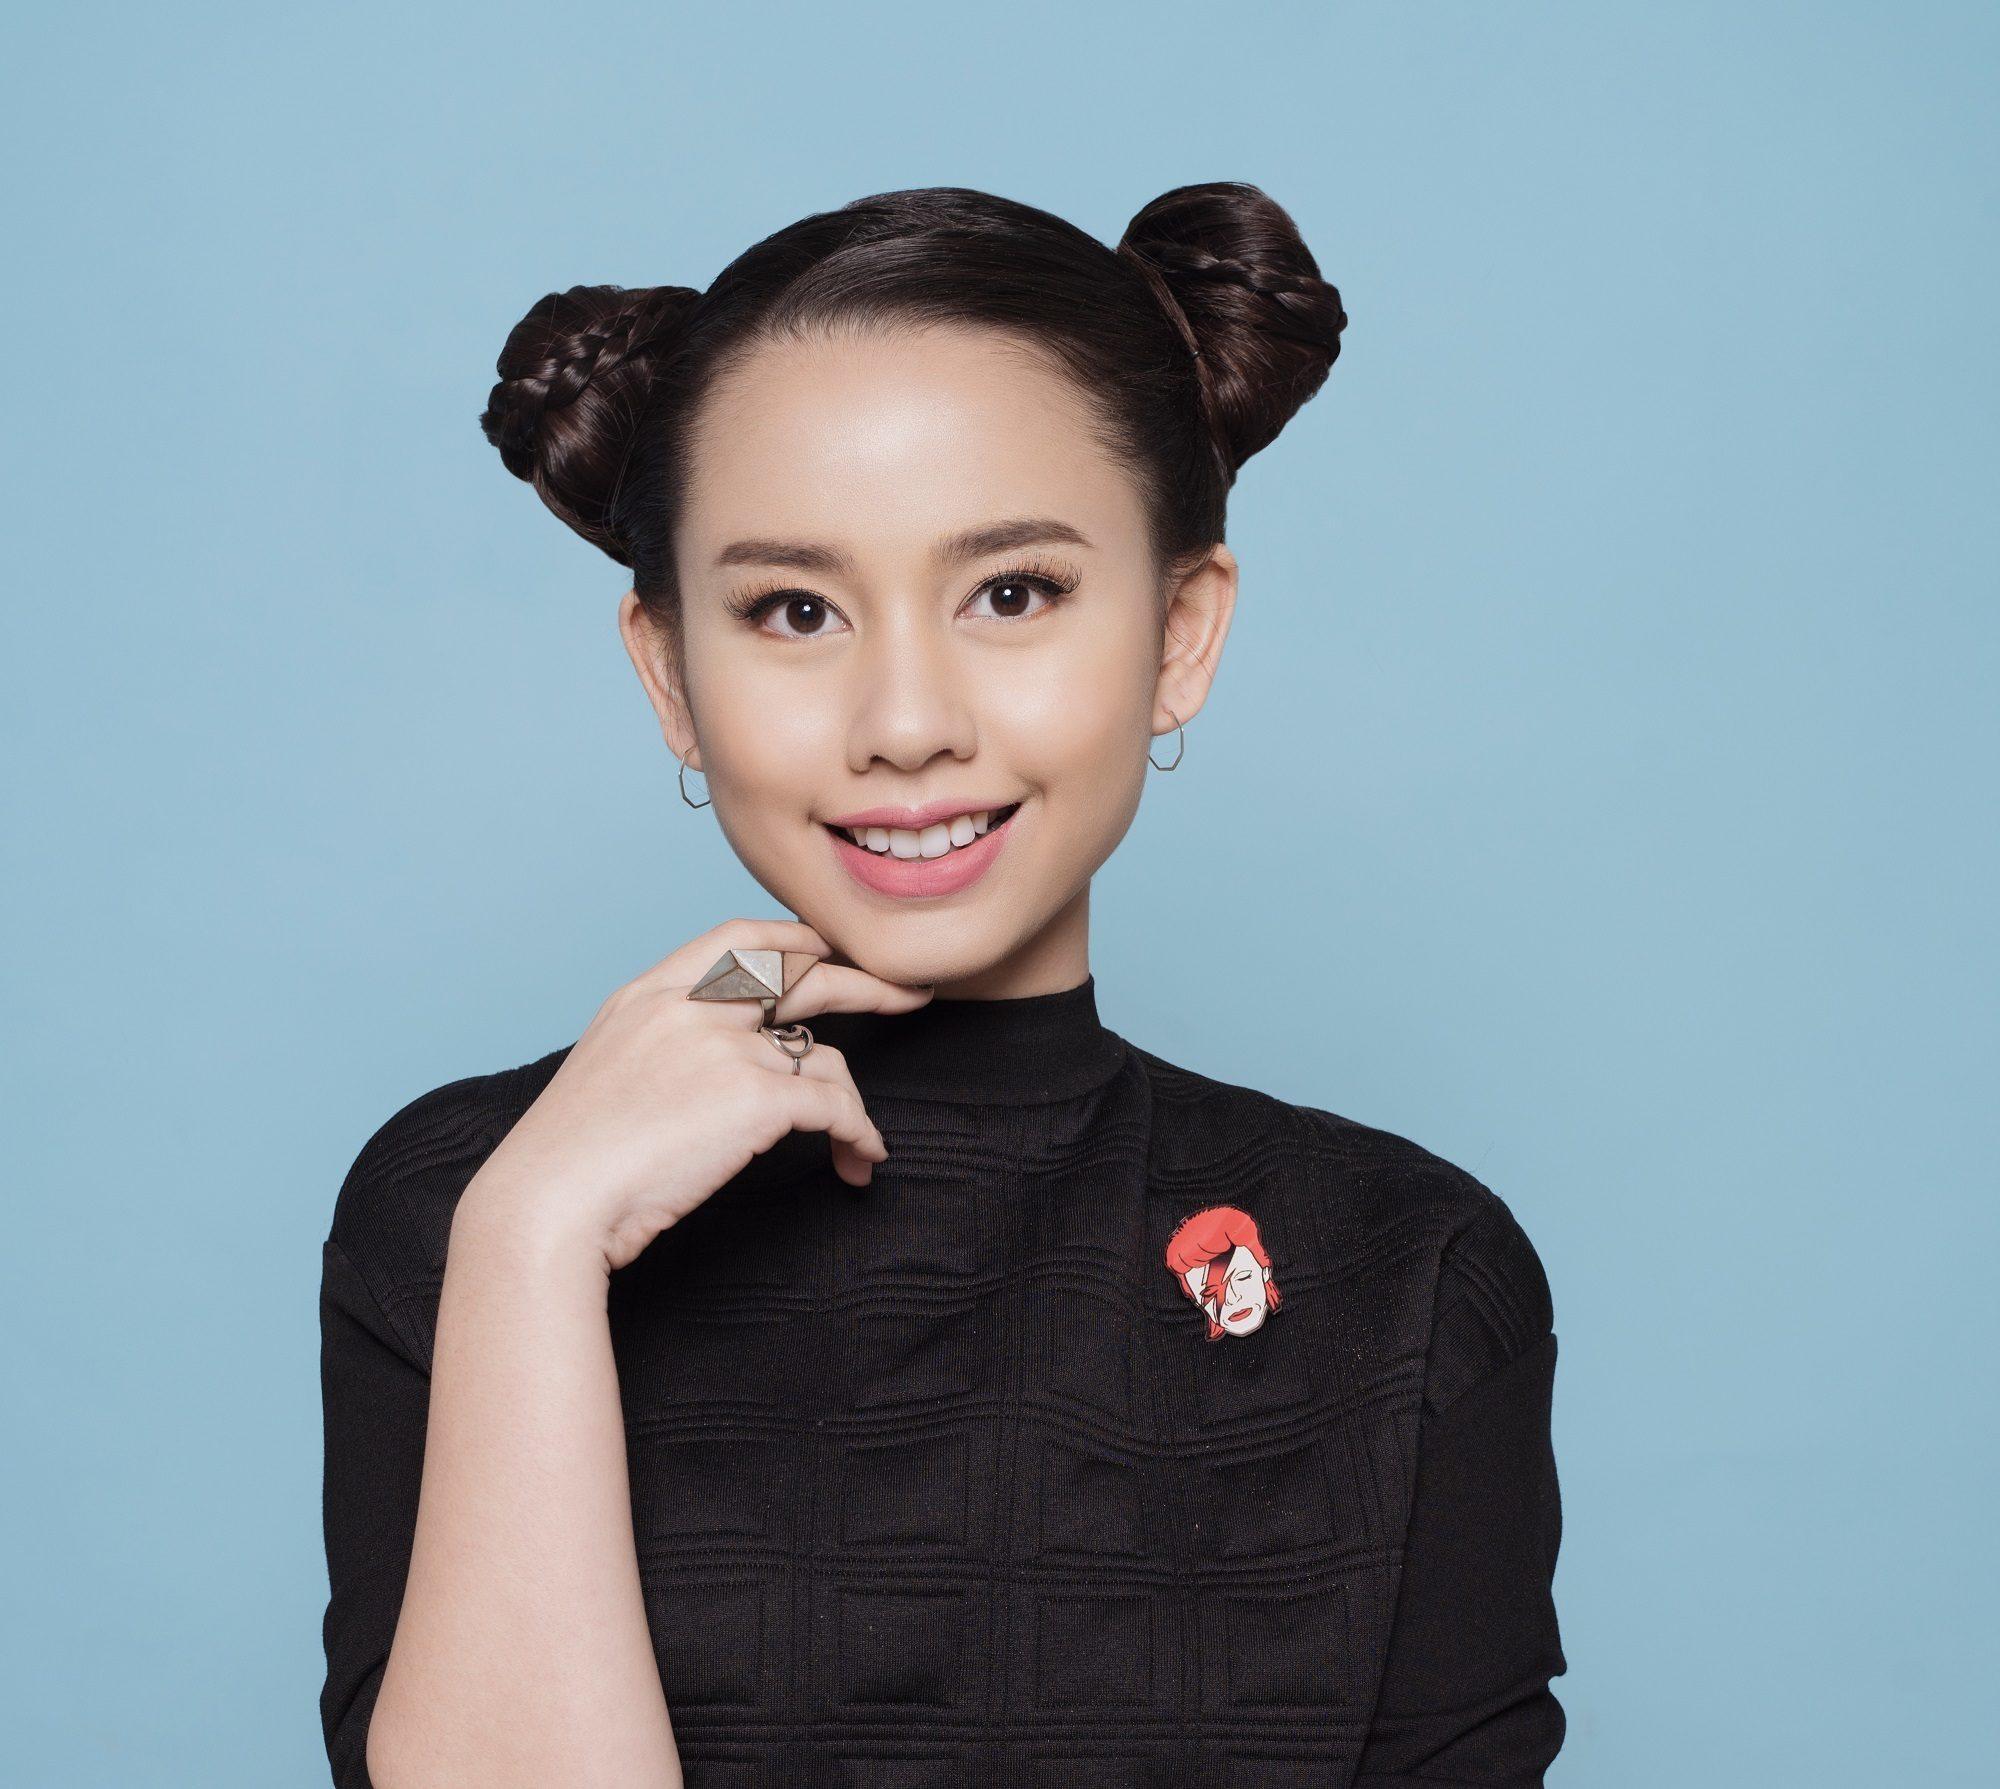 Advent calendar: Closeup shot of Asian girl with black hair in space buns wearing a black shirt